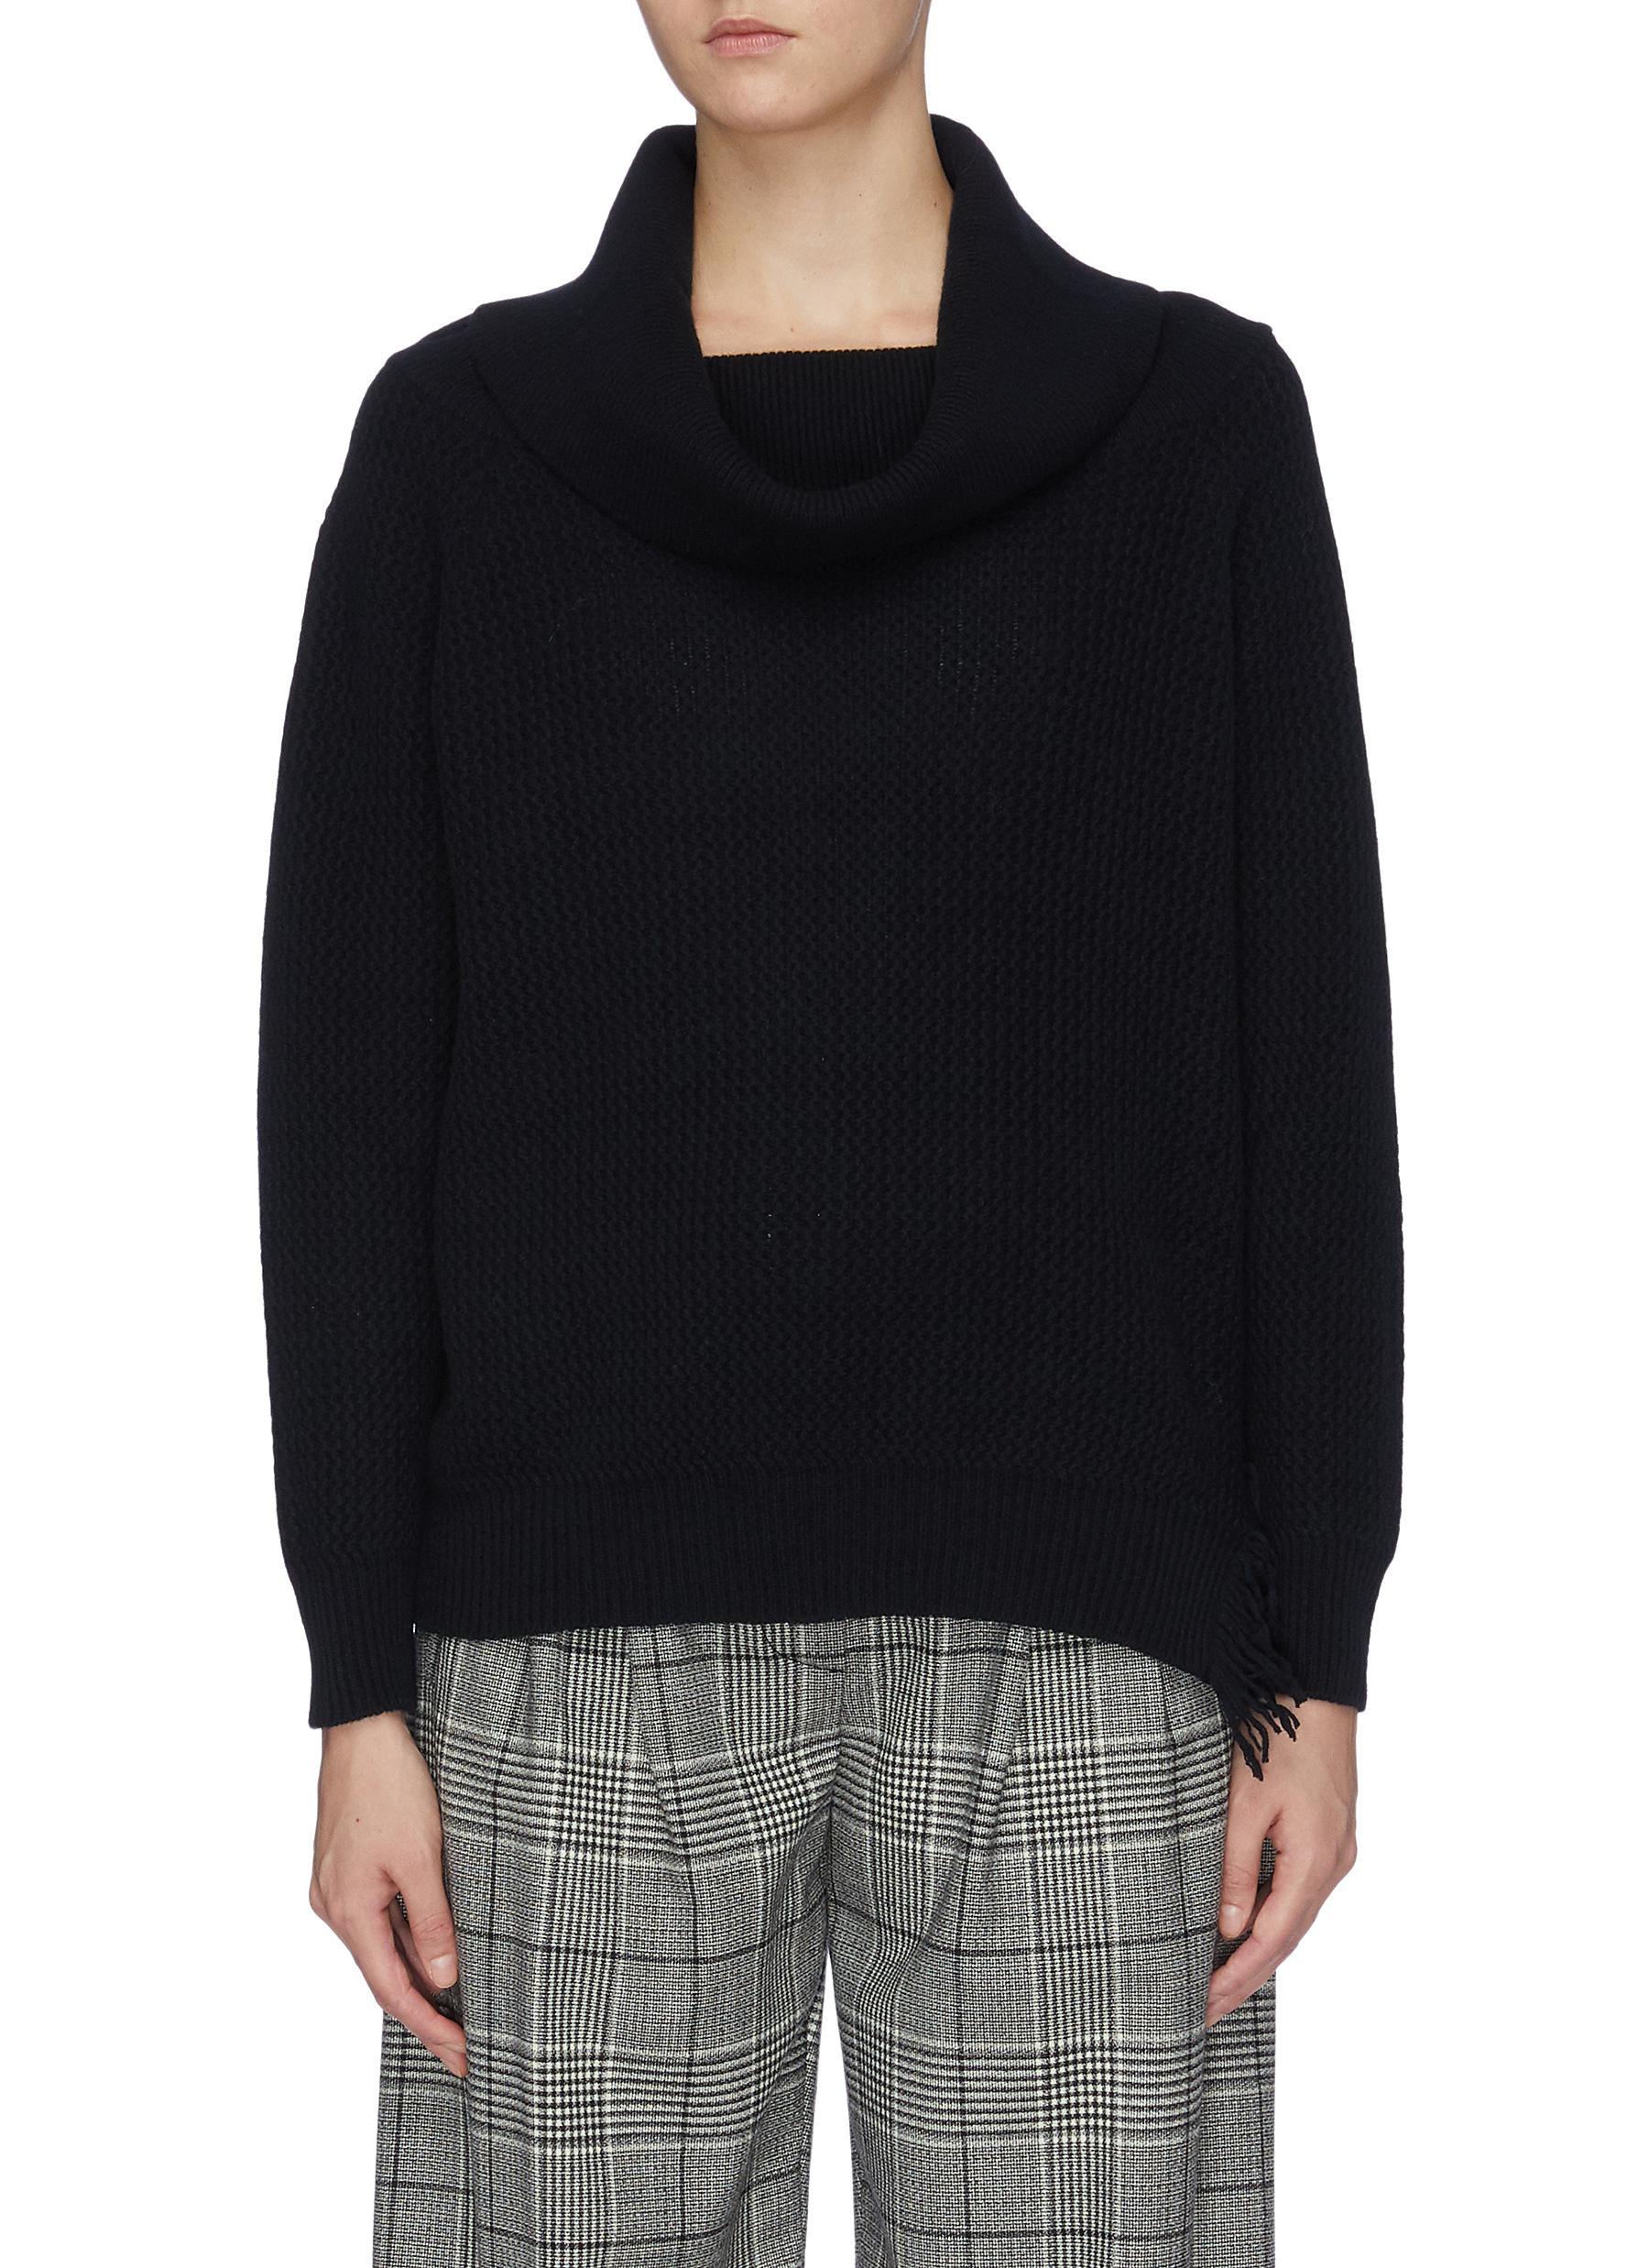 Frayed hem oversized cowl turtleneck sweater by Stella Mccartney